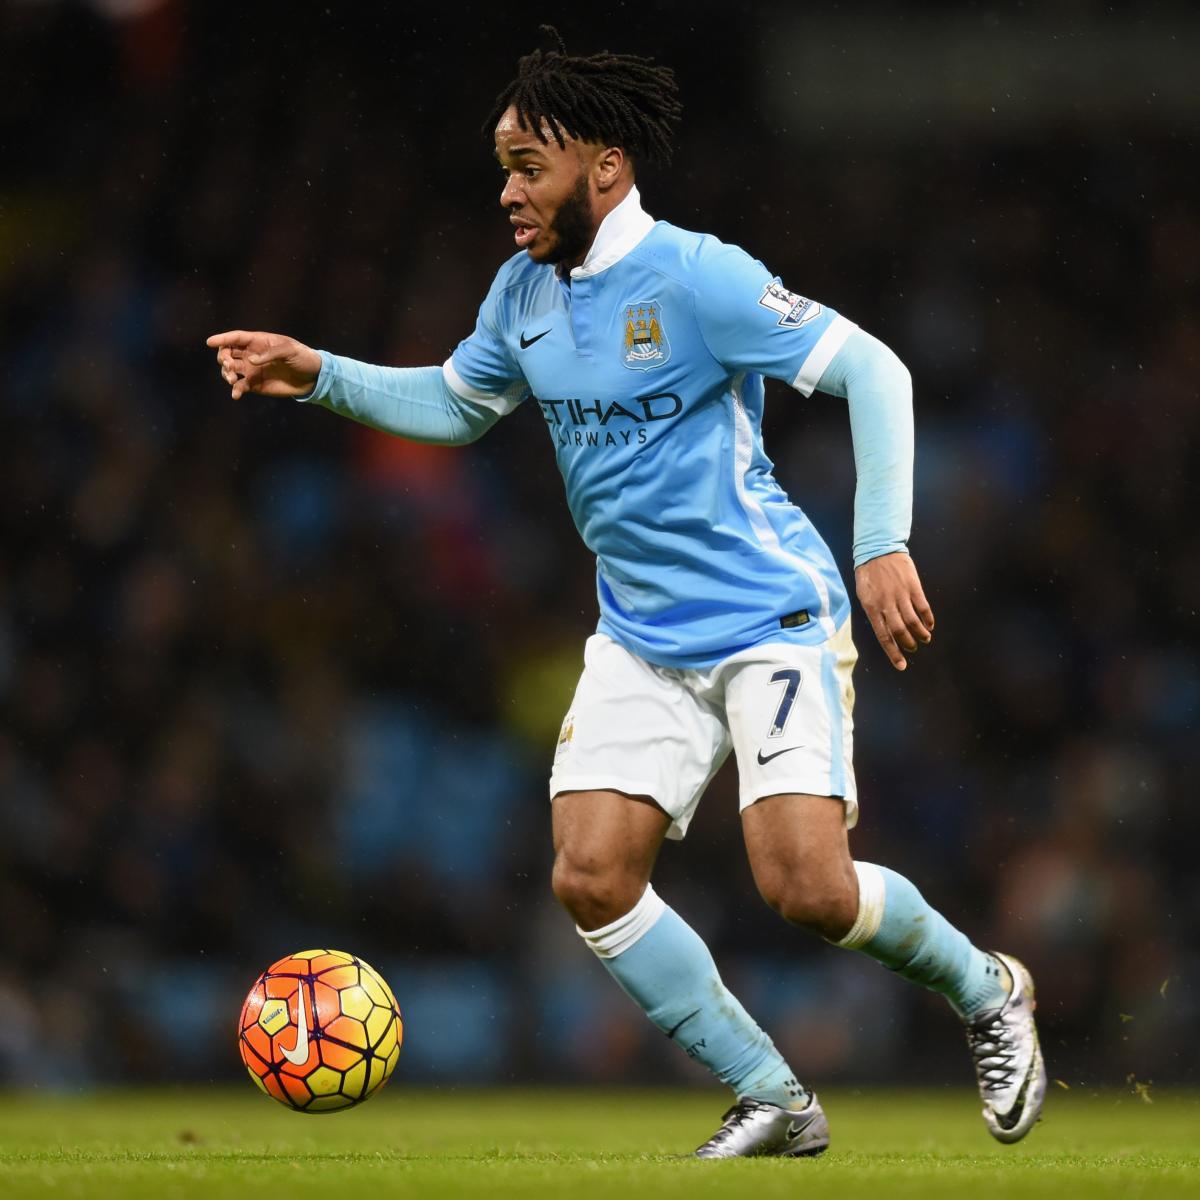 Aston Villa Vs Man City Live Score